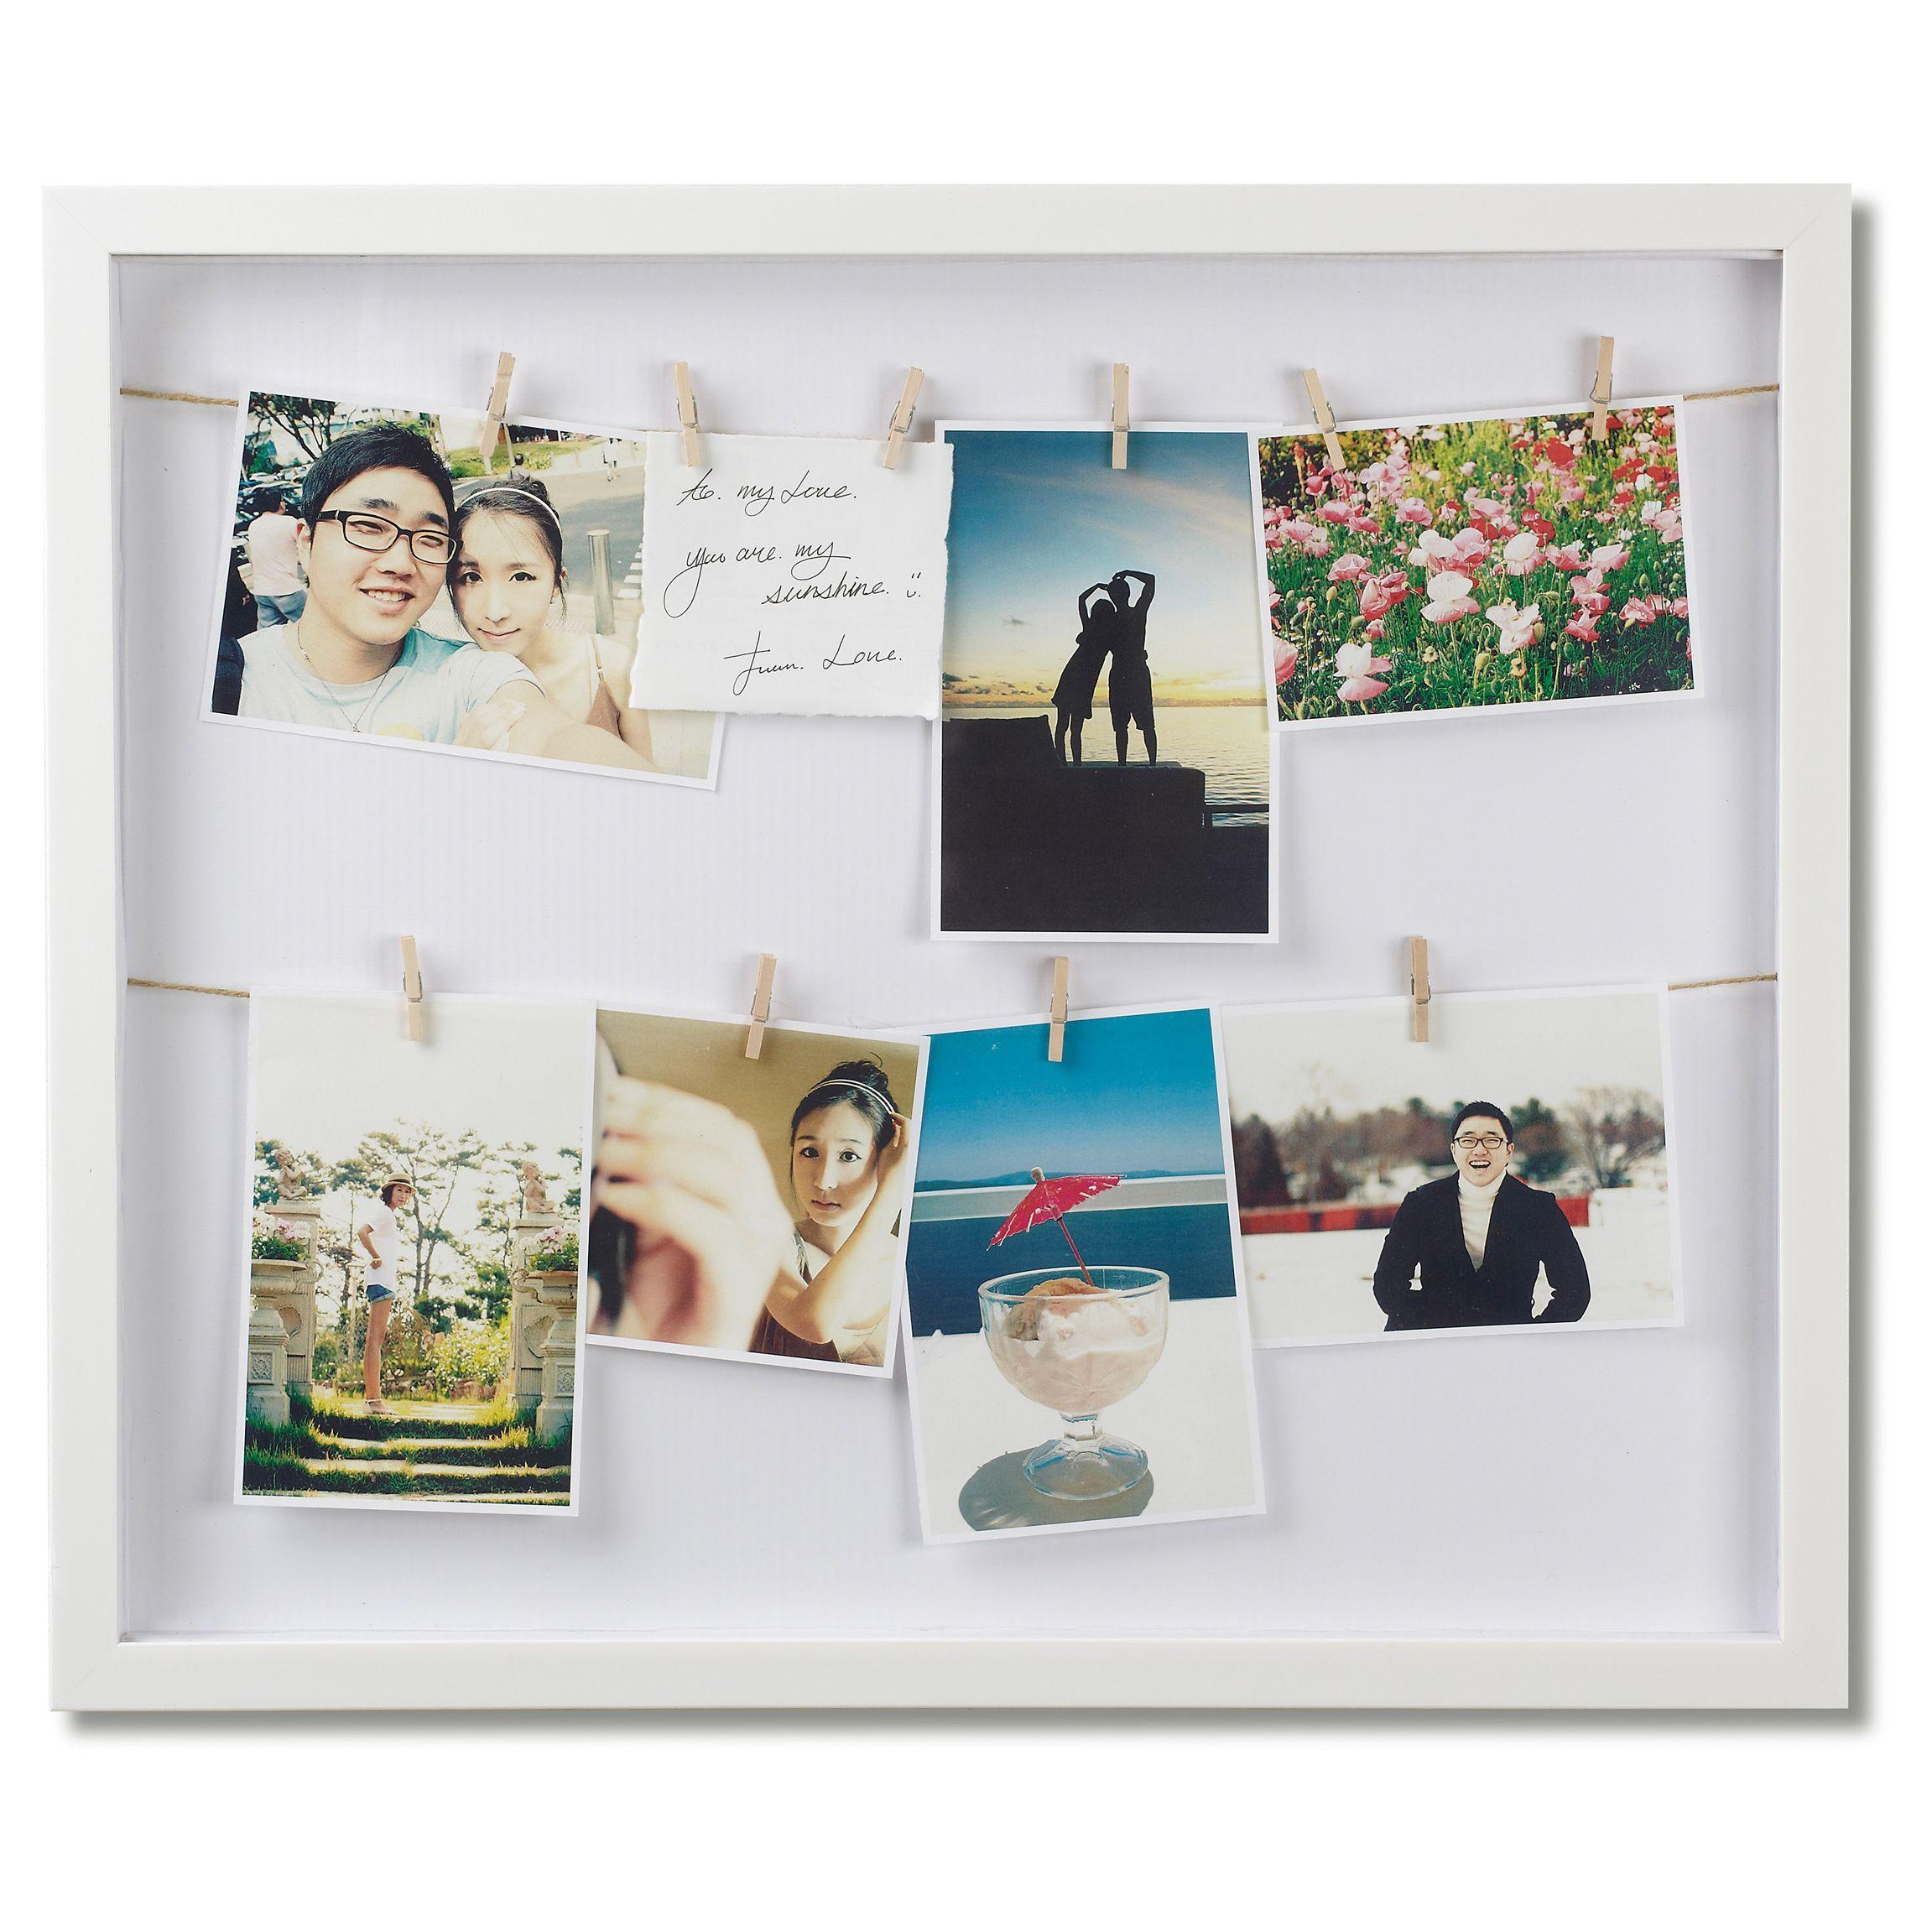 Umbra Clothesline Photo Display Picture Frame (White) | Pinterest ...